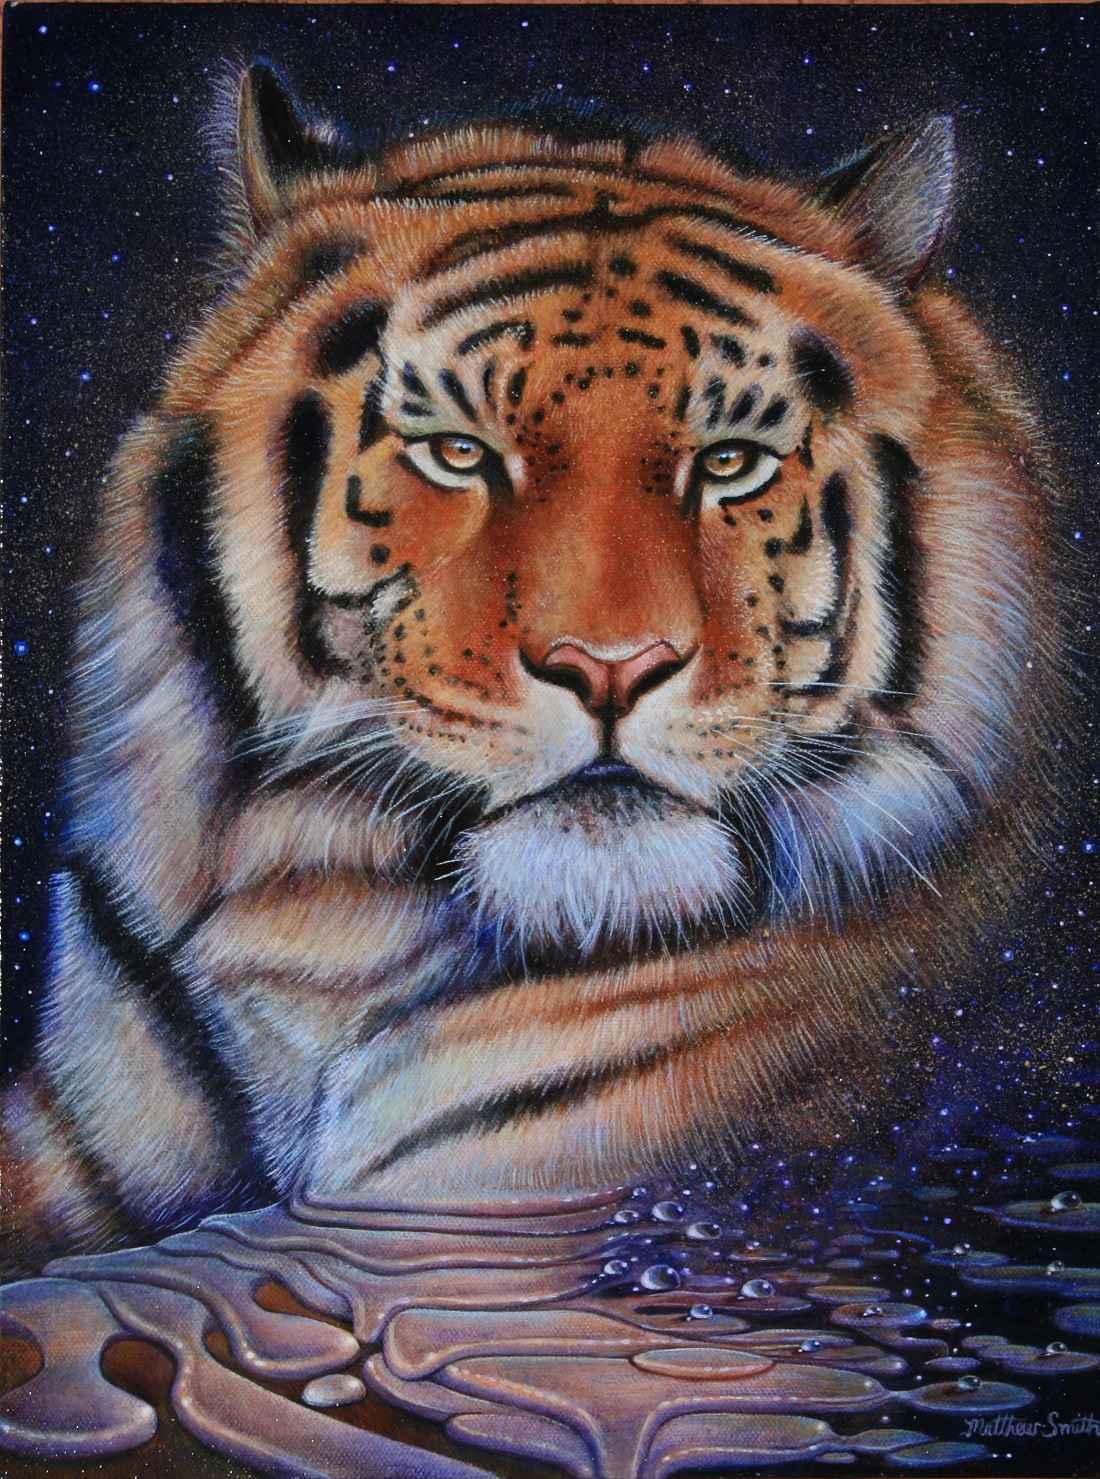 Melting Tiger by  Matthew Smith - Masterpiece Online